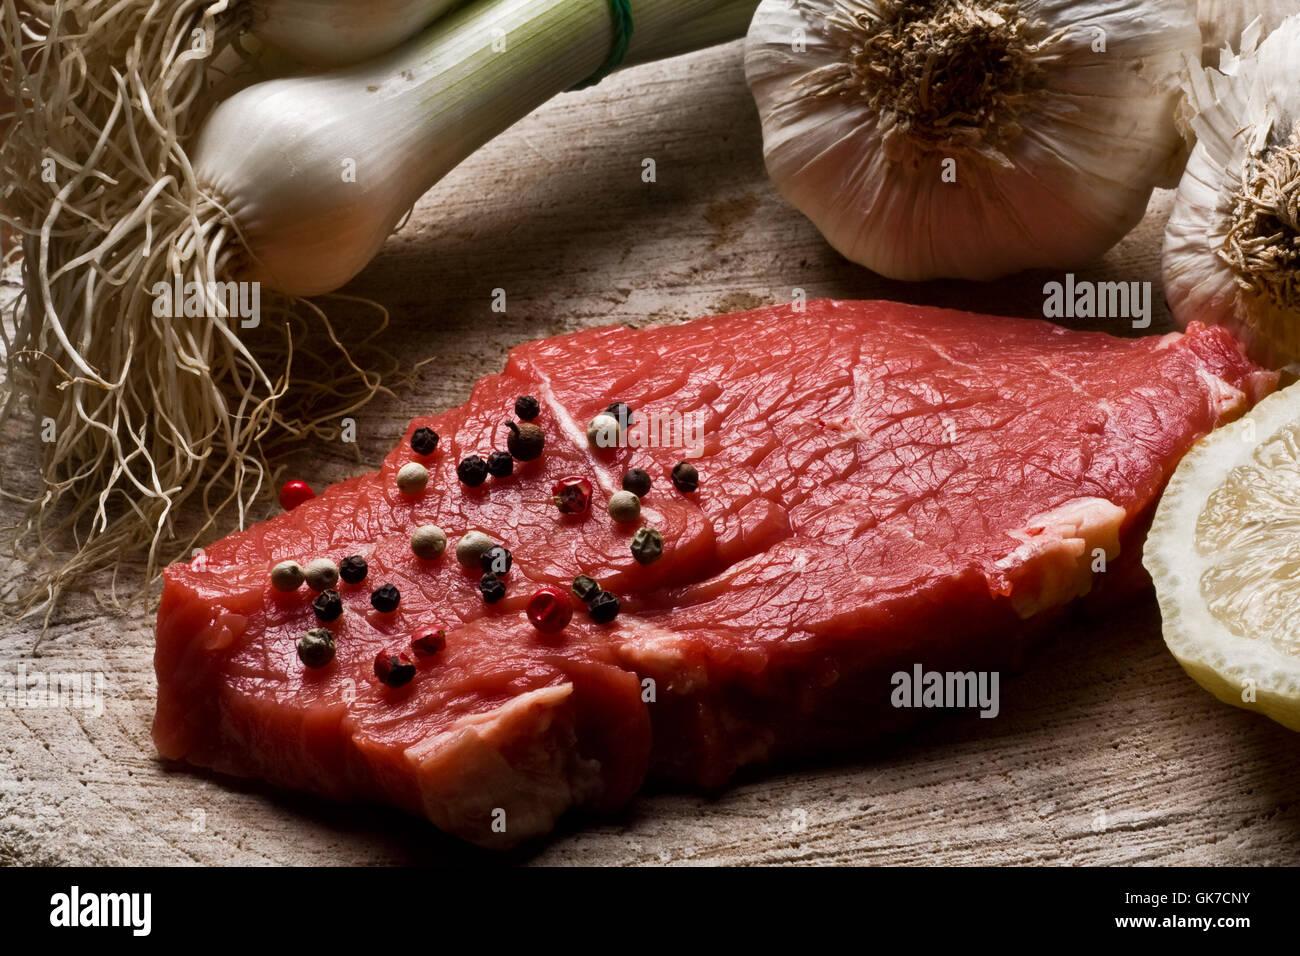 Stillleben-Lebensmittel-Nahrungsmittel Stockbild